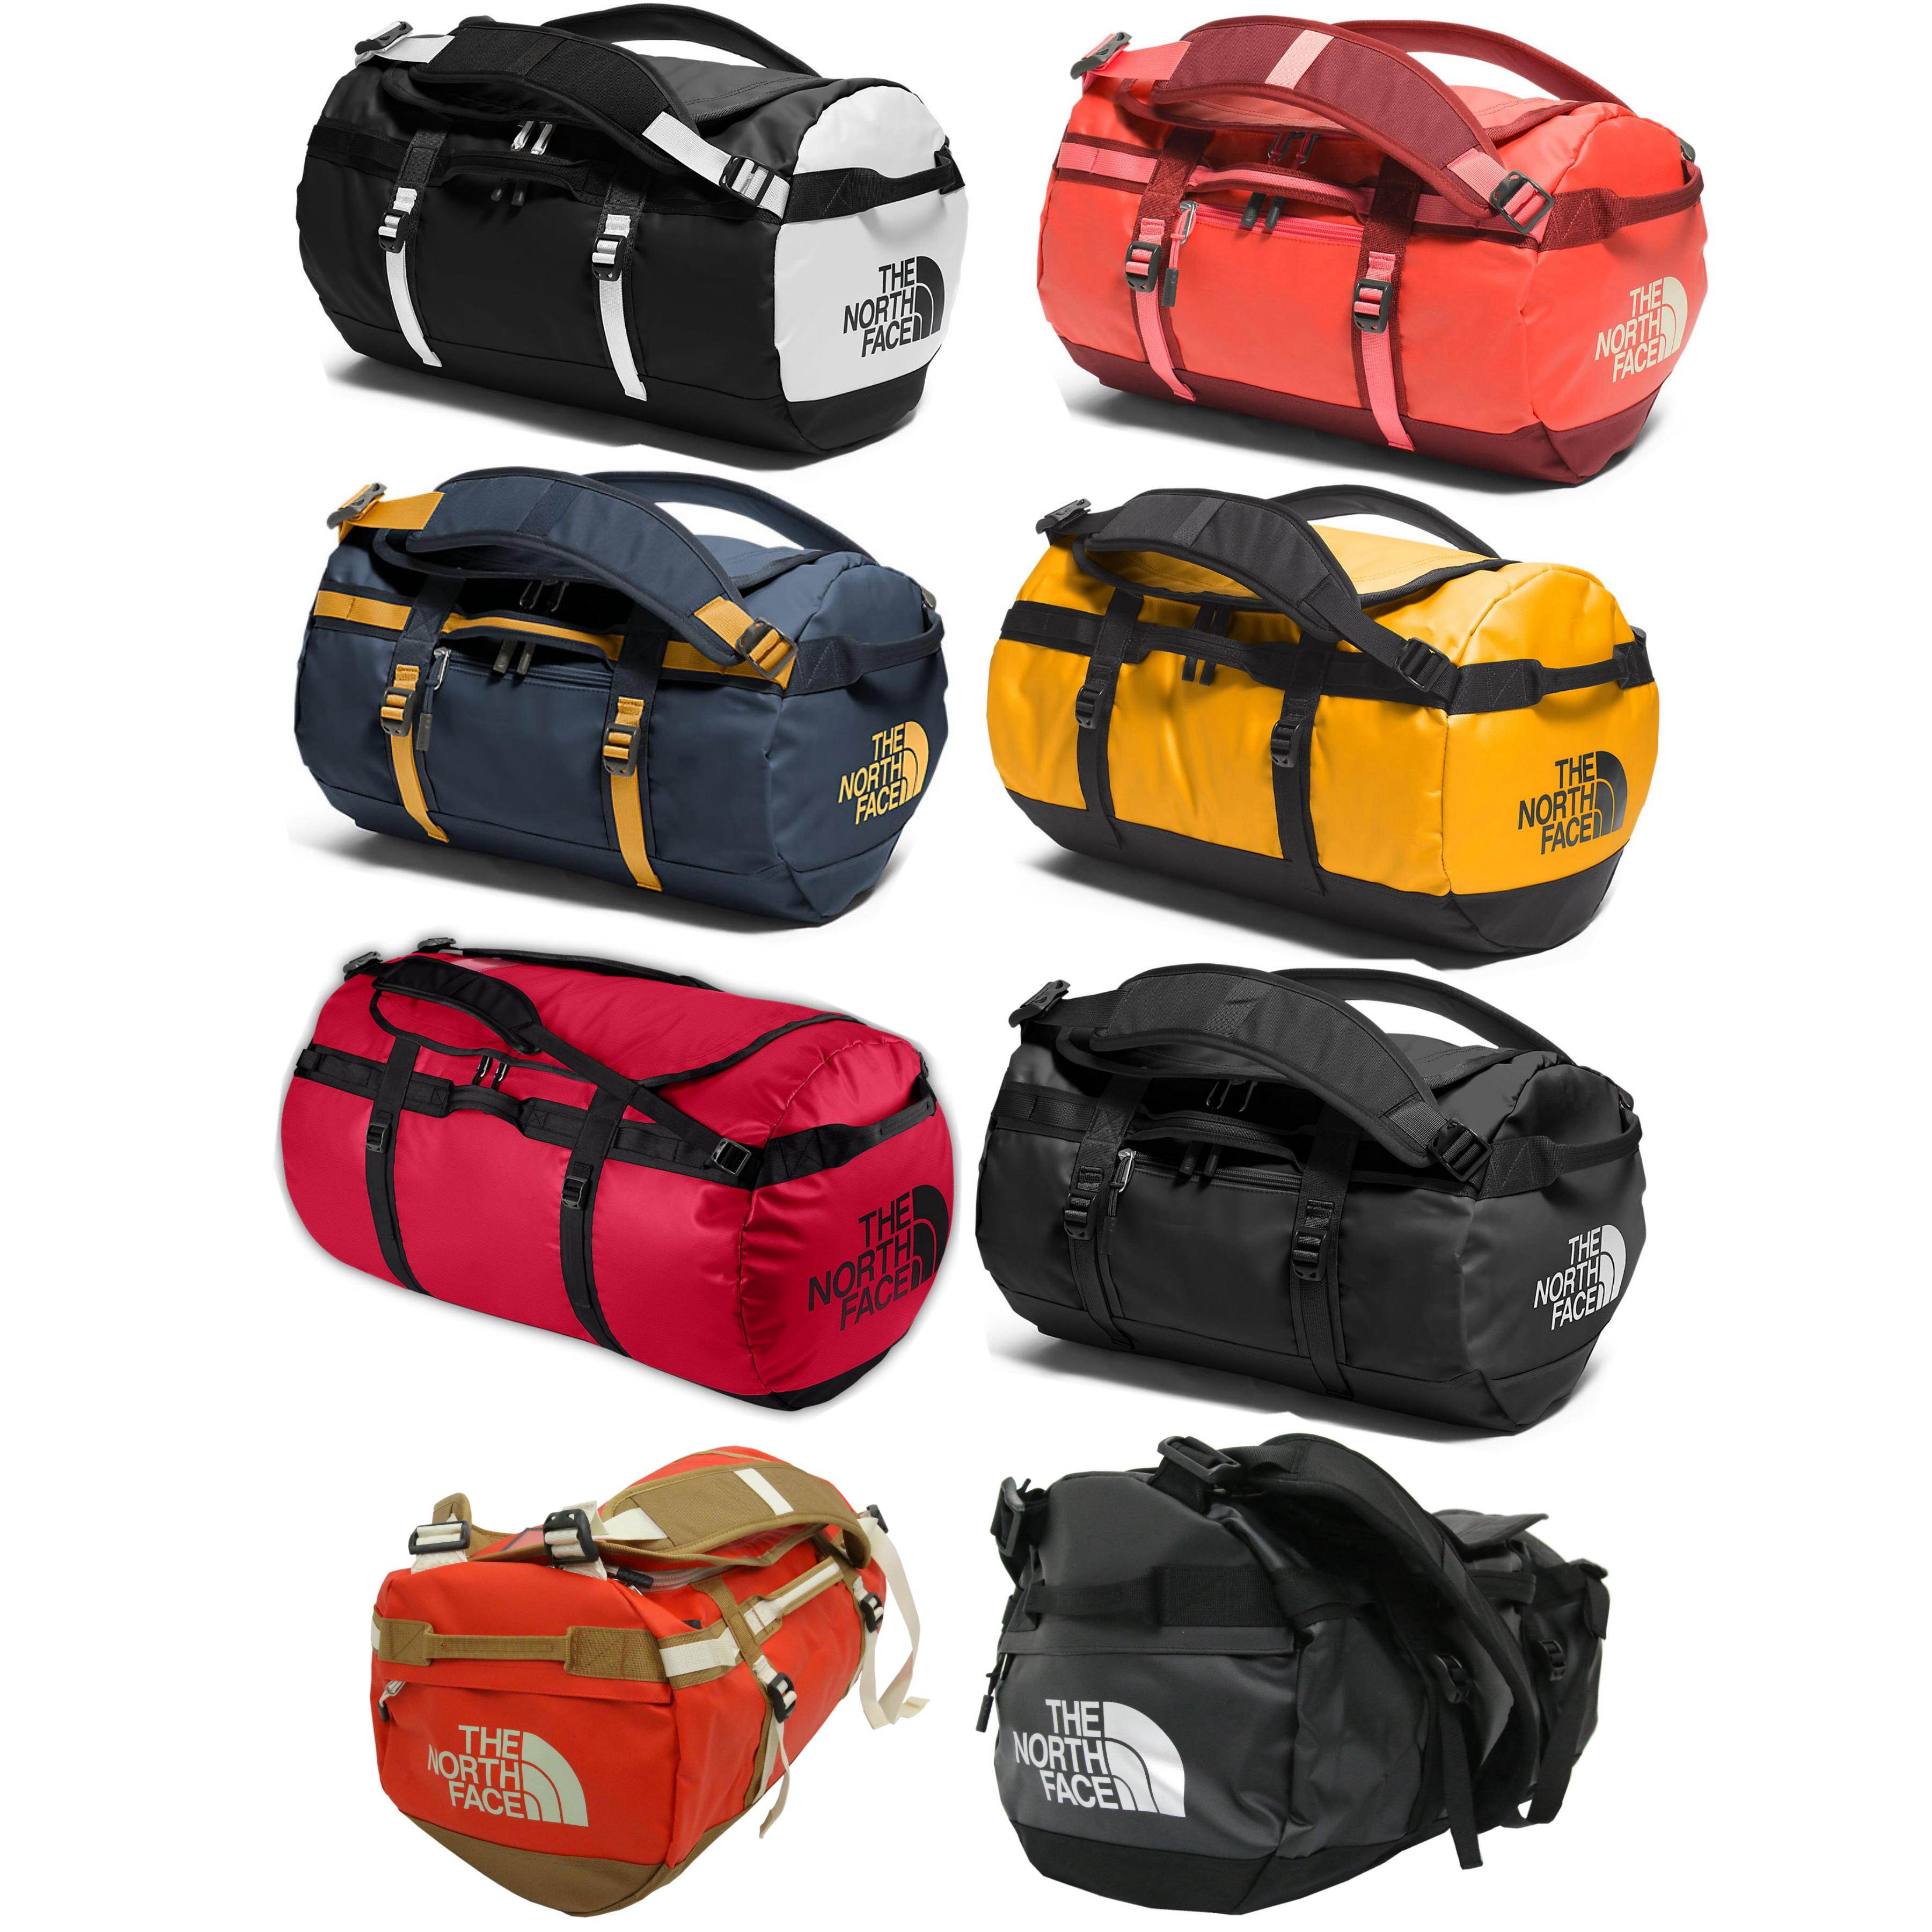 the north face base camp duffel reisetasche rucksack verschiedene gr en ebay. Black Bedroom Furniture Sets. Home Design Ideas